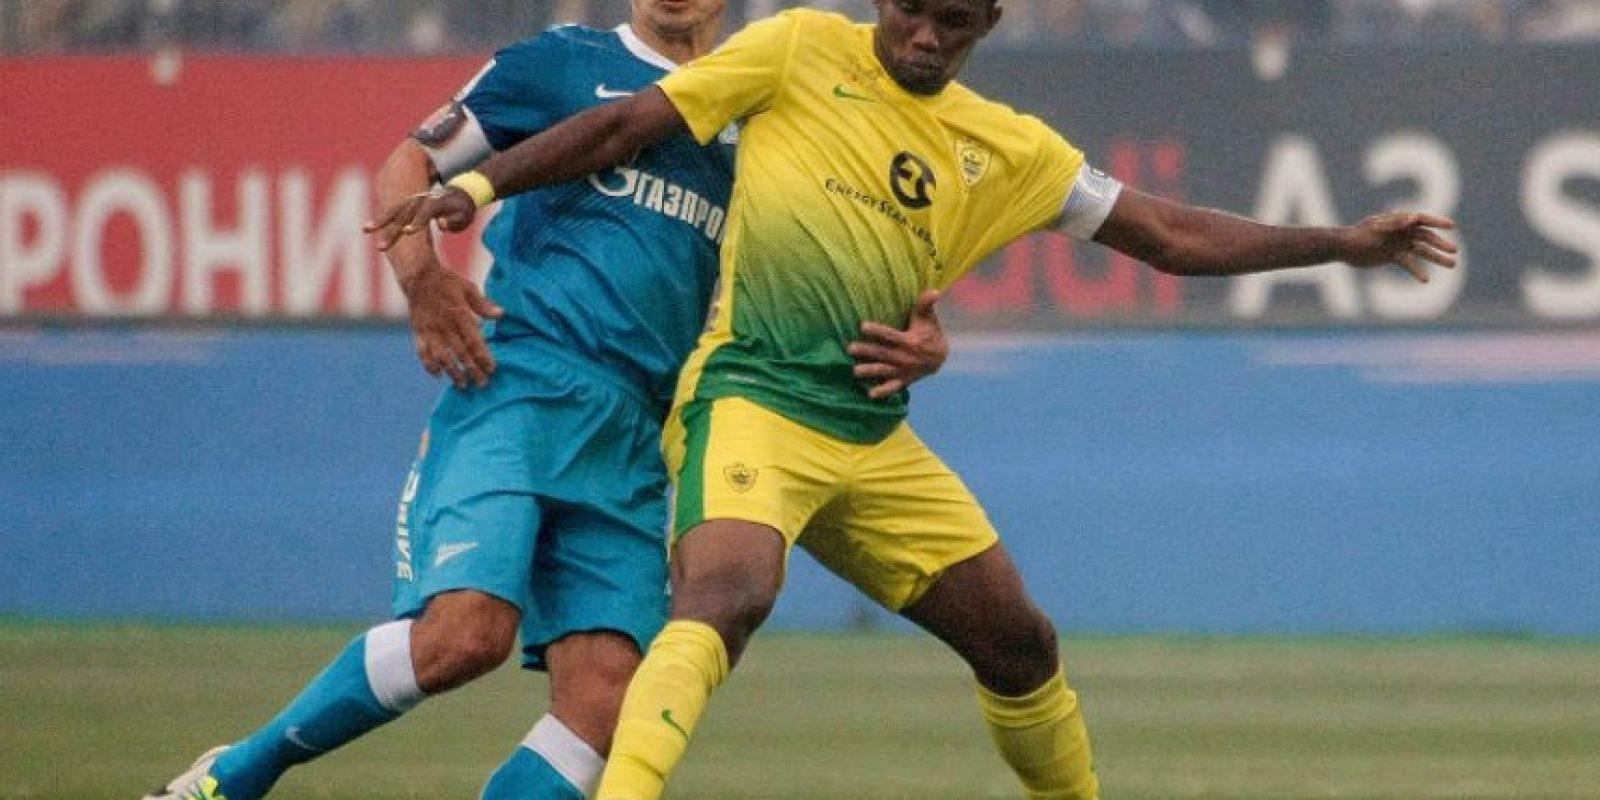 Eto'o jugó en el Anzhi de 2011 a 2013 Foto:Getty